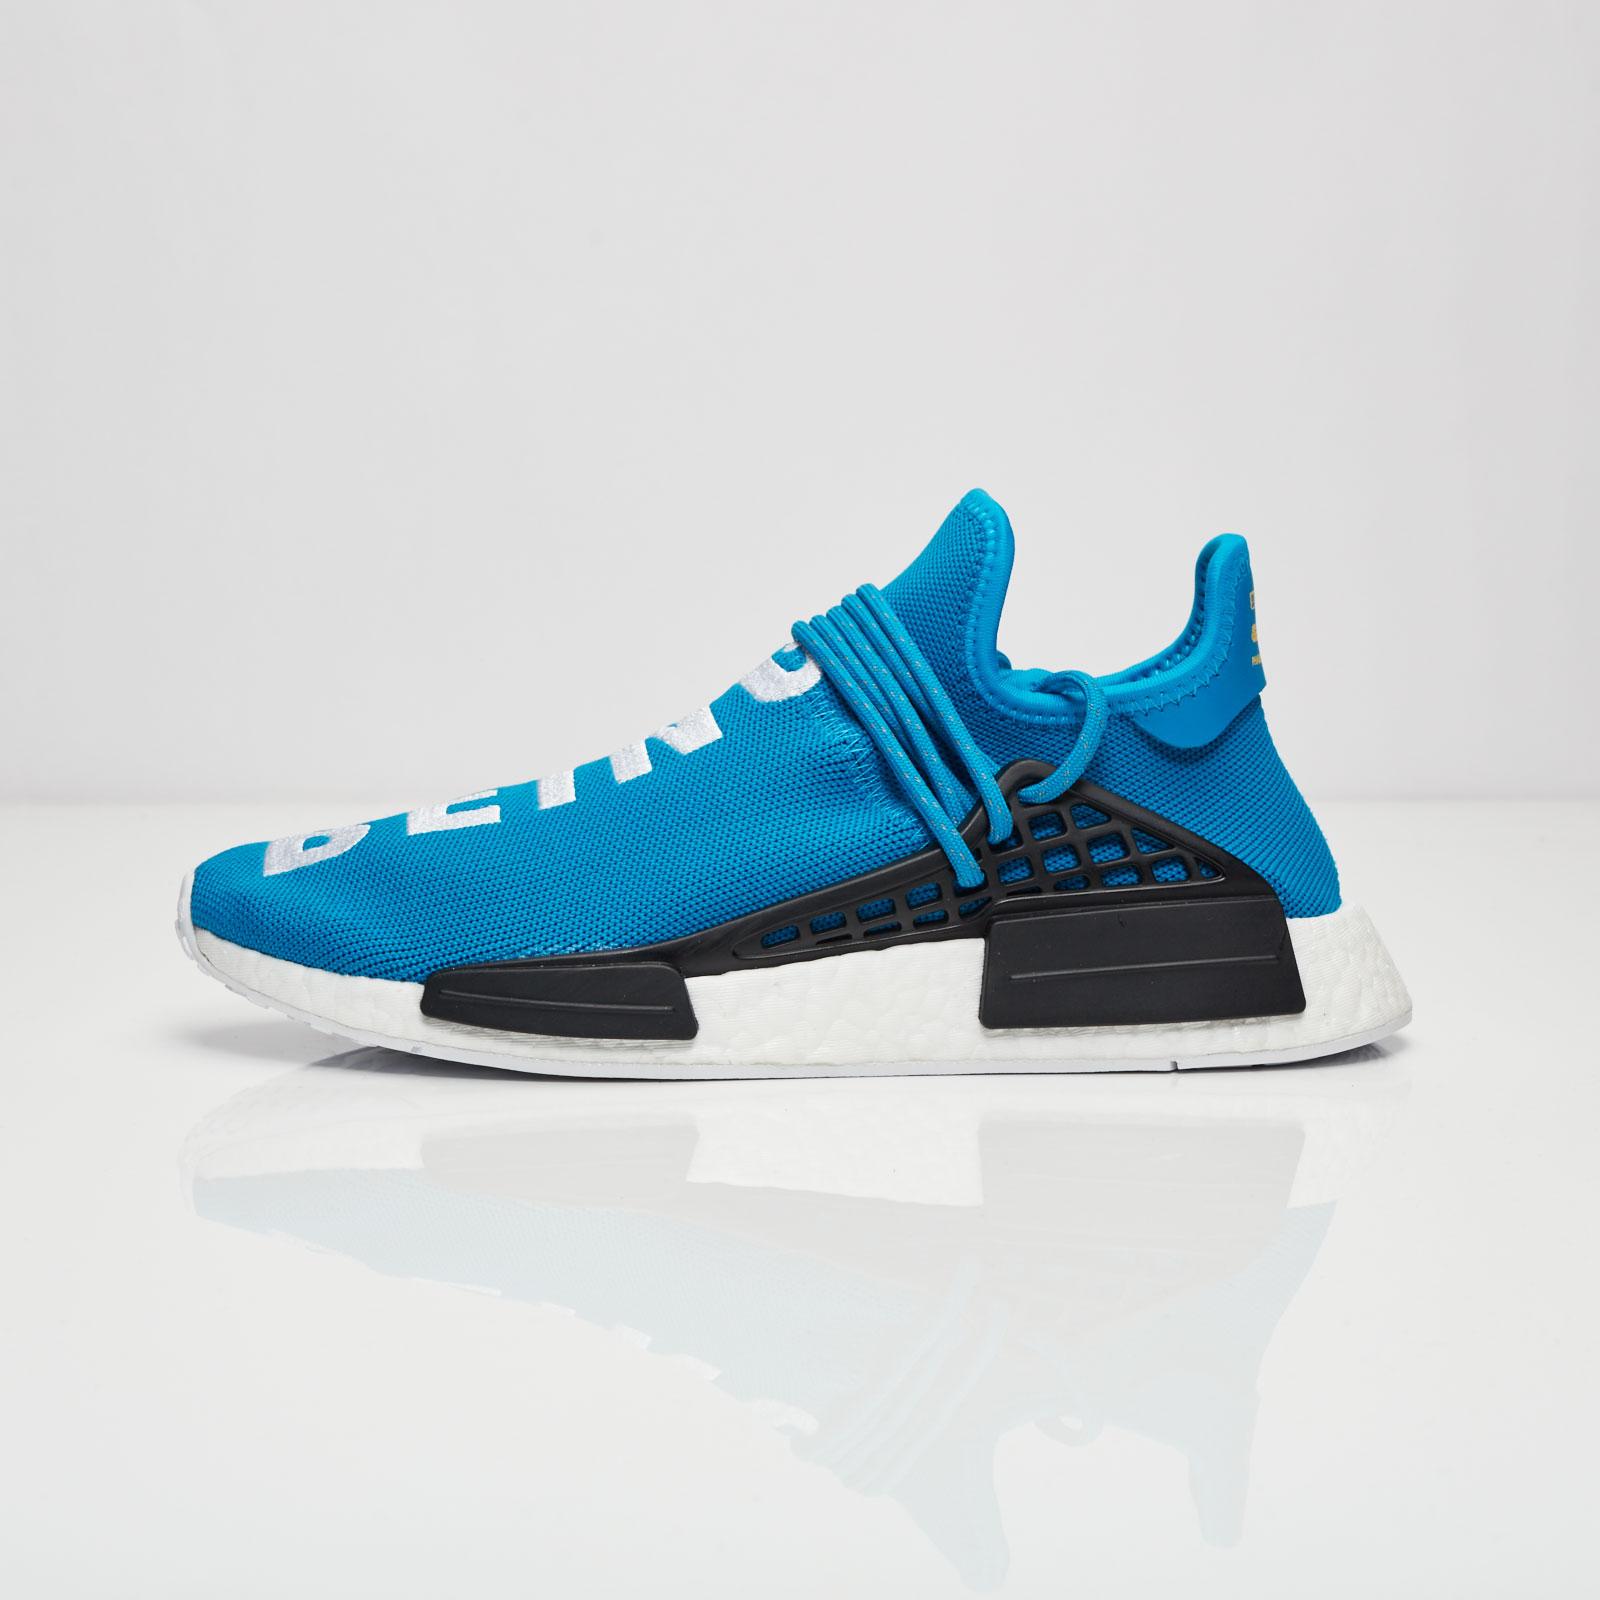 online retailer 78985 7d9ed adidas PW Human Race NMD - Bb0618 - Sneakersnstuff   sneakers   streetwear  online since 1999